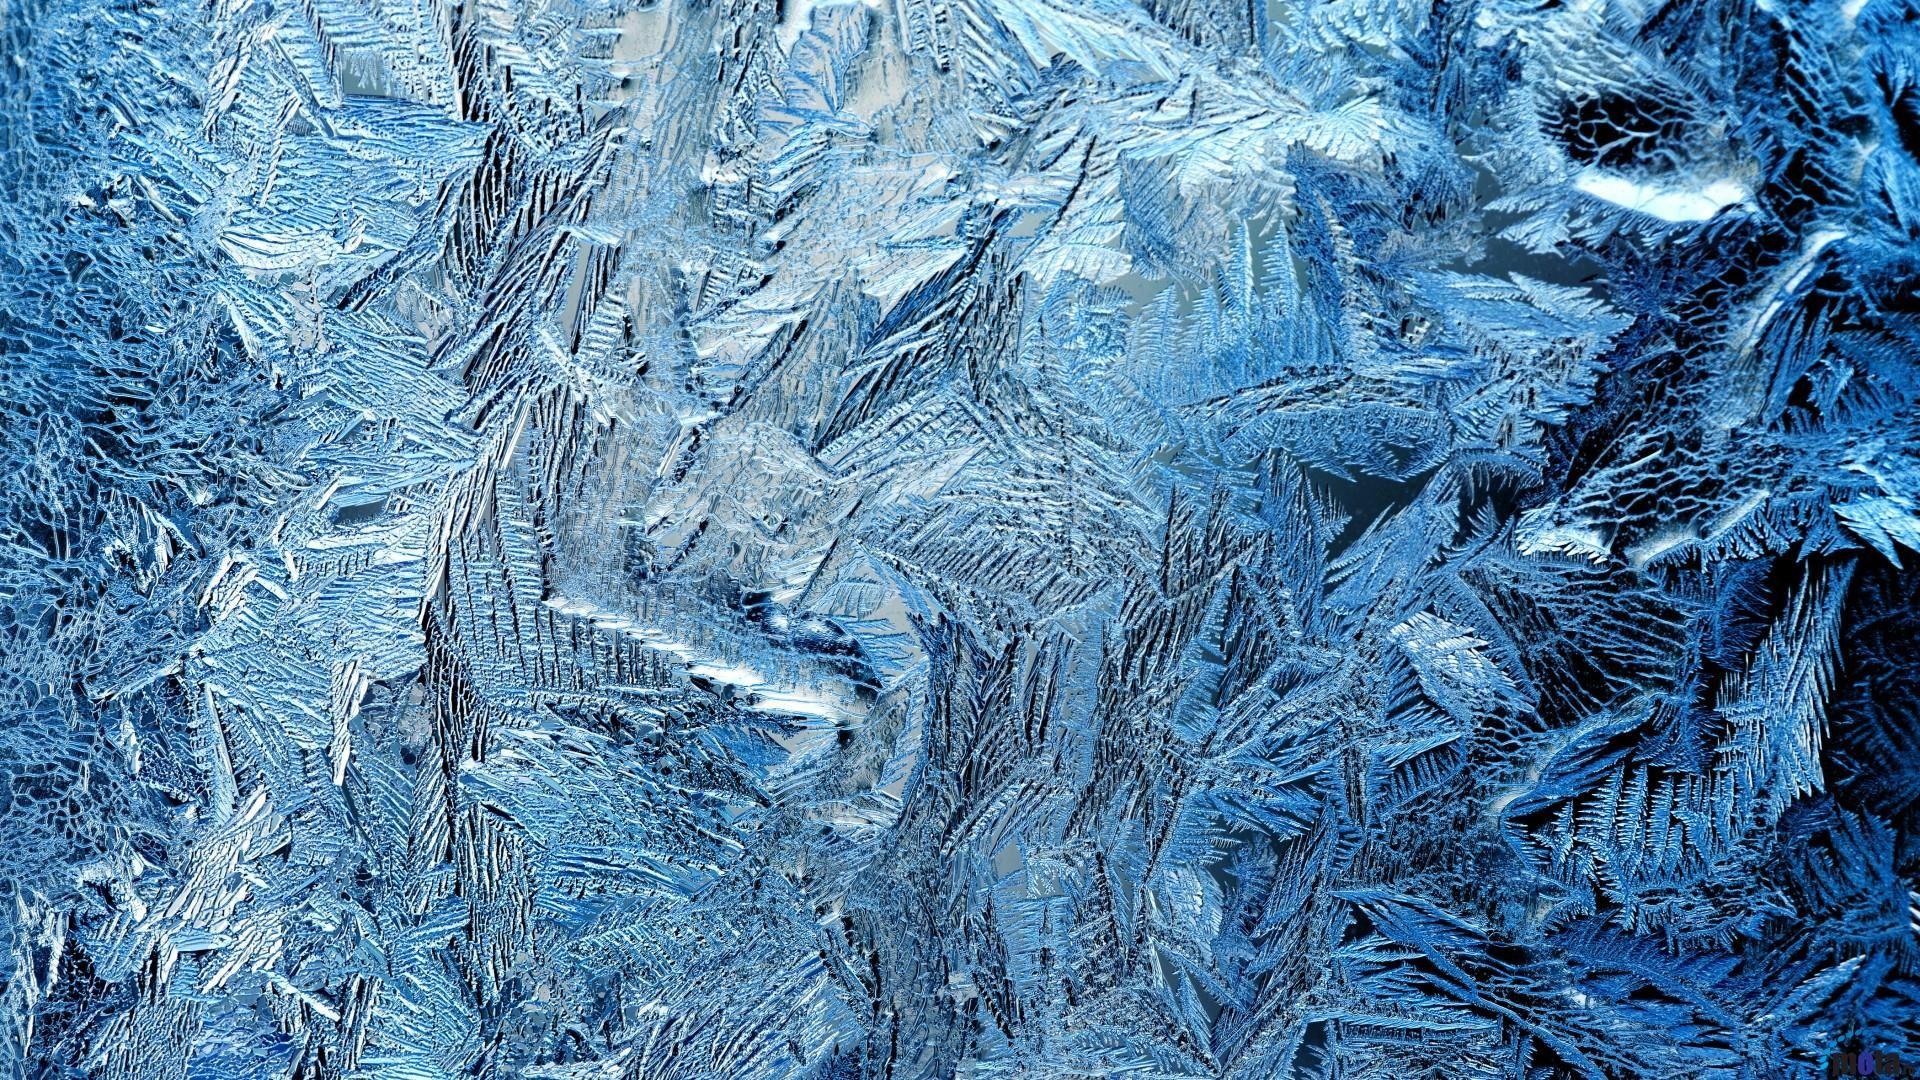 Winter Patterns On The Window 1920x1080 wallpaper